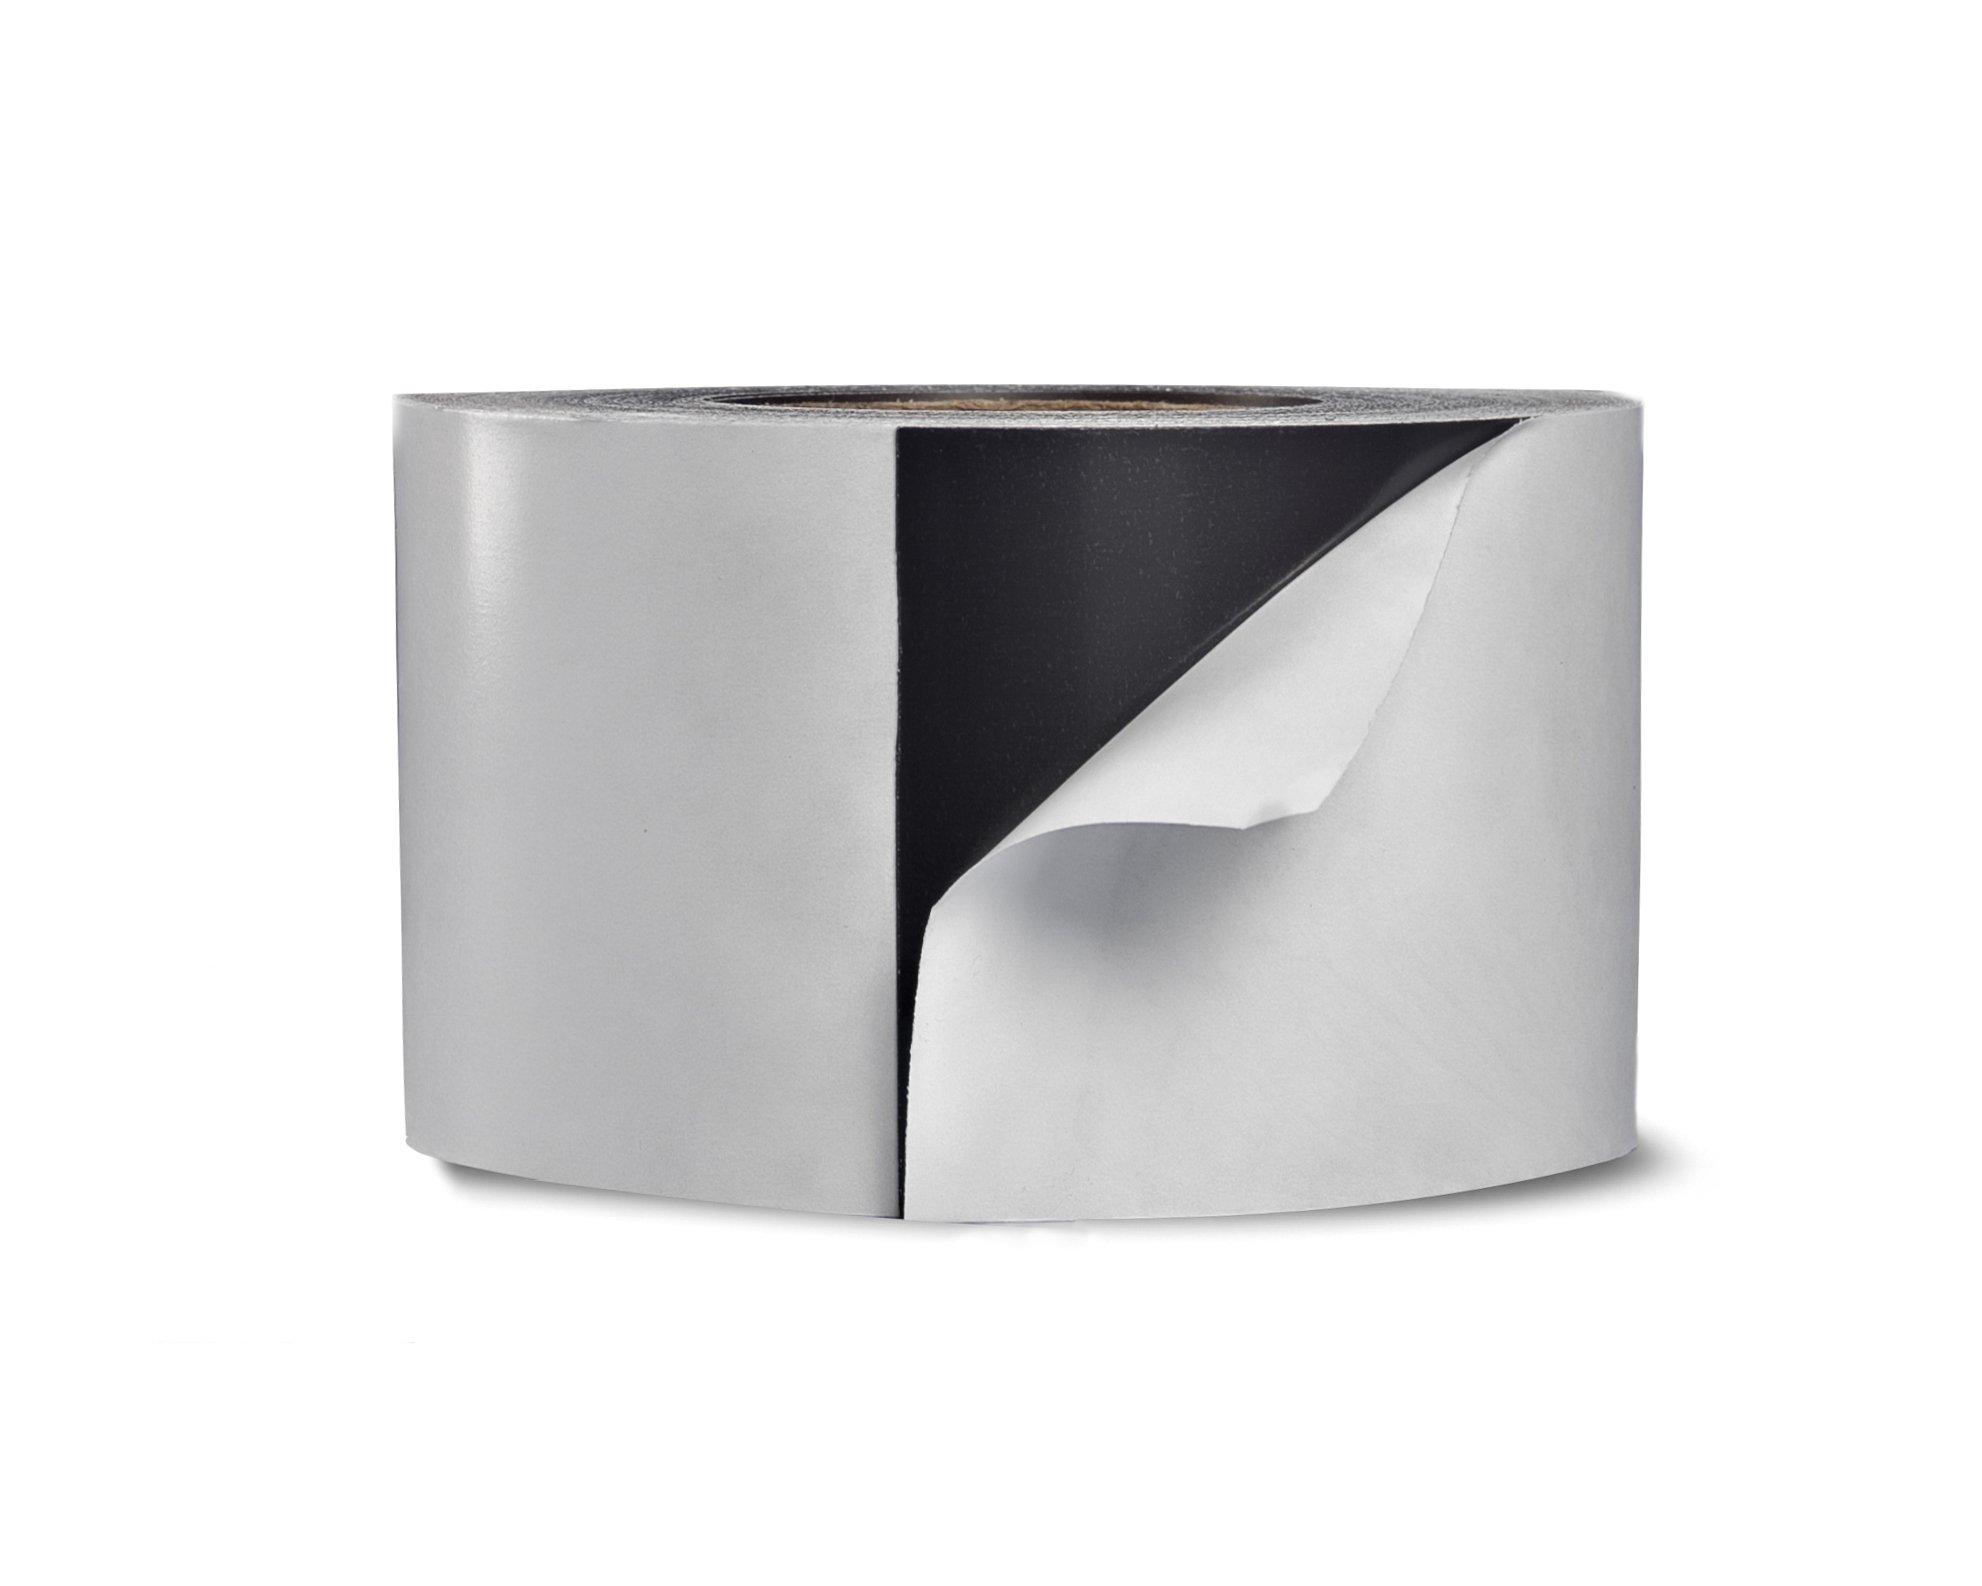 Waterproof Outdoor/Indoor Acrylic Adhesive Magnet Tape - 3'' X 25' 60 mil Strip Roll